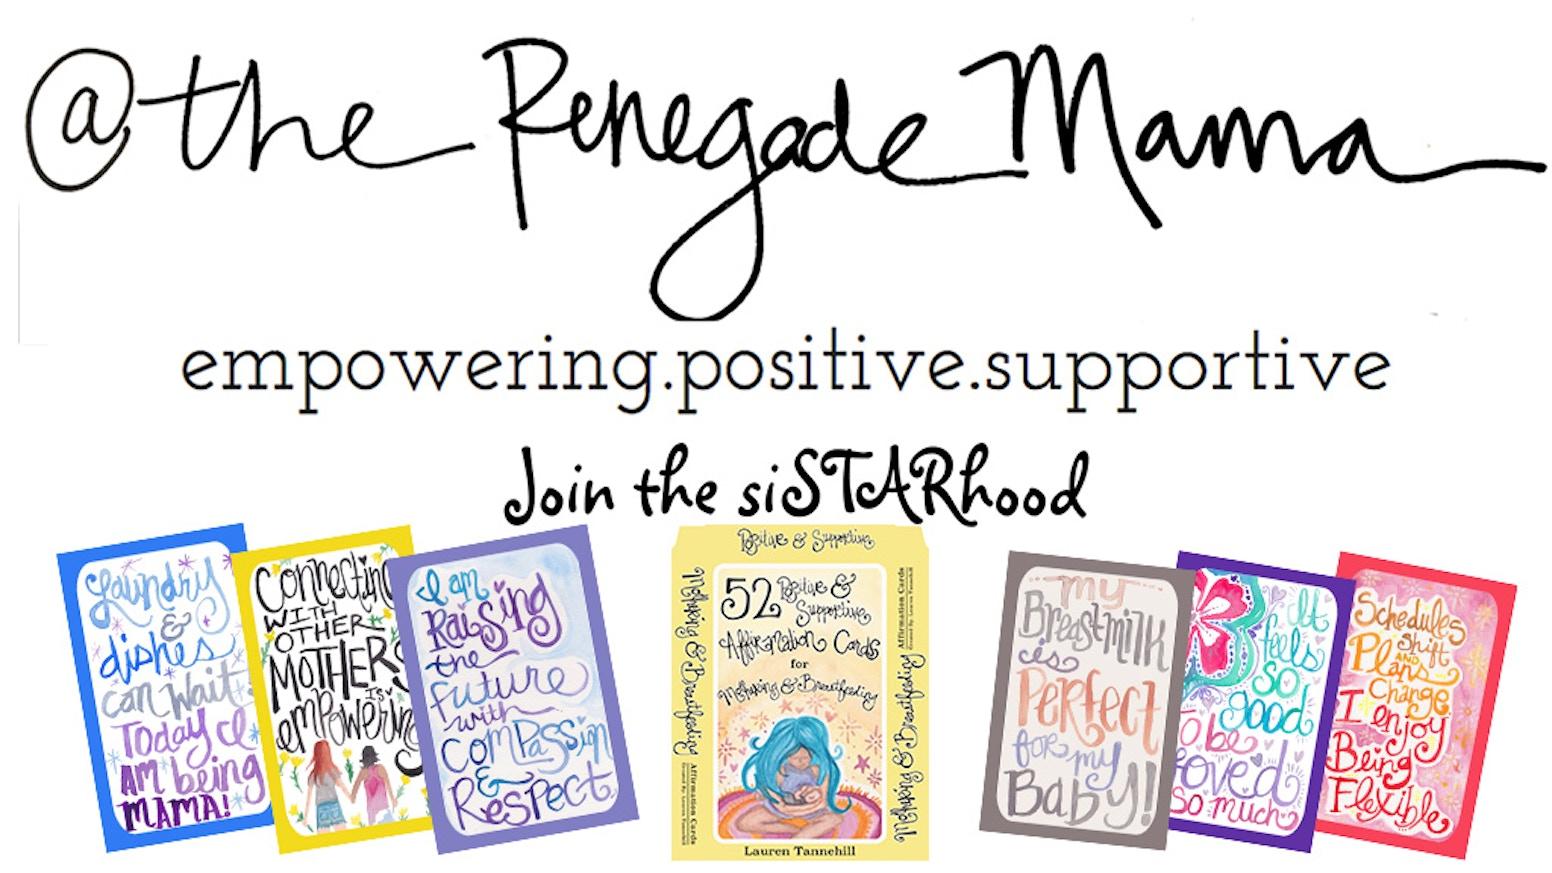 Supportive mothering postpartum affirmation cards by lauren supportive mothering postpartum affirmation cards altavistaventures Gallery